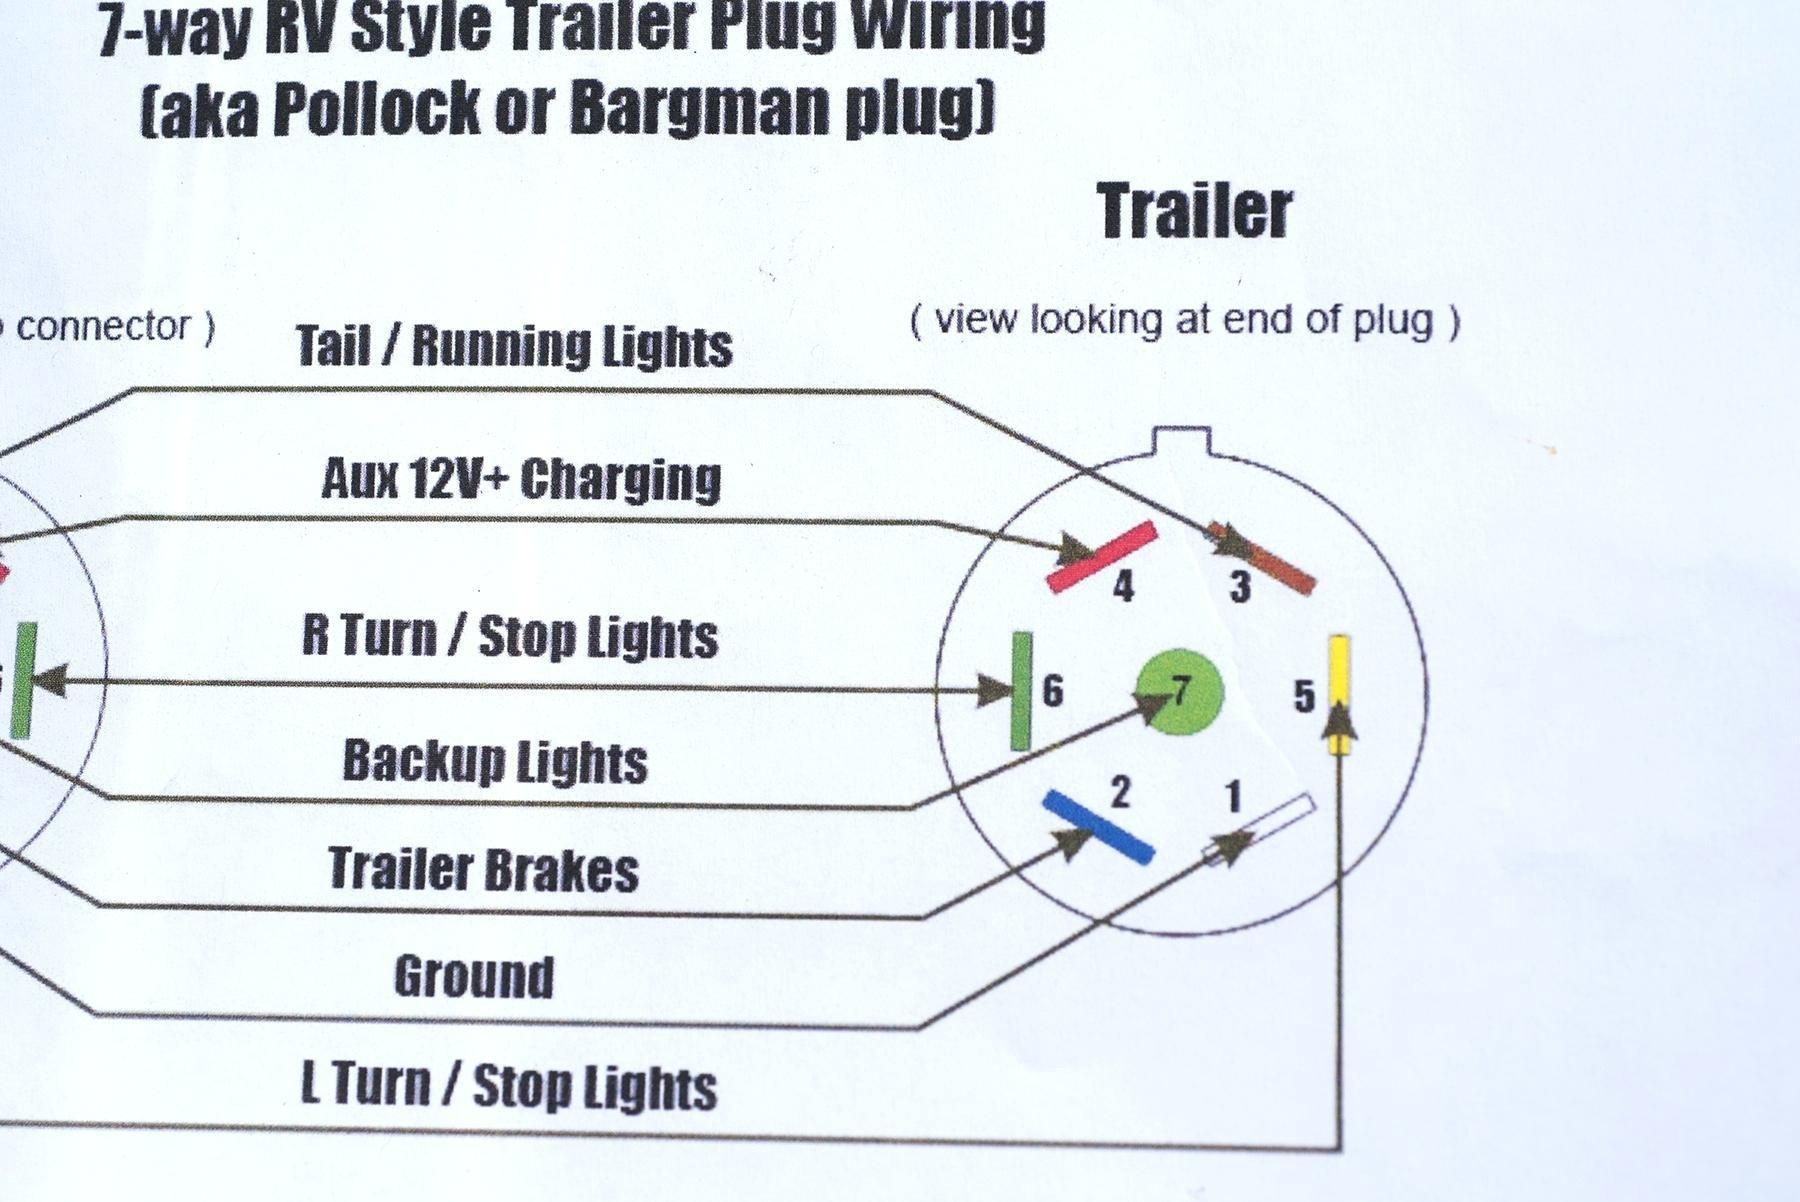 Gm 6 Way Wiring Diagram   Wiring Library - 6 Way Trailer Plug Wiring Diagram